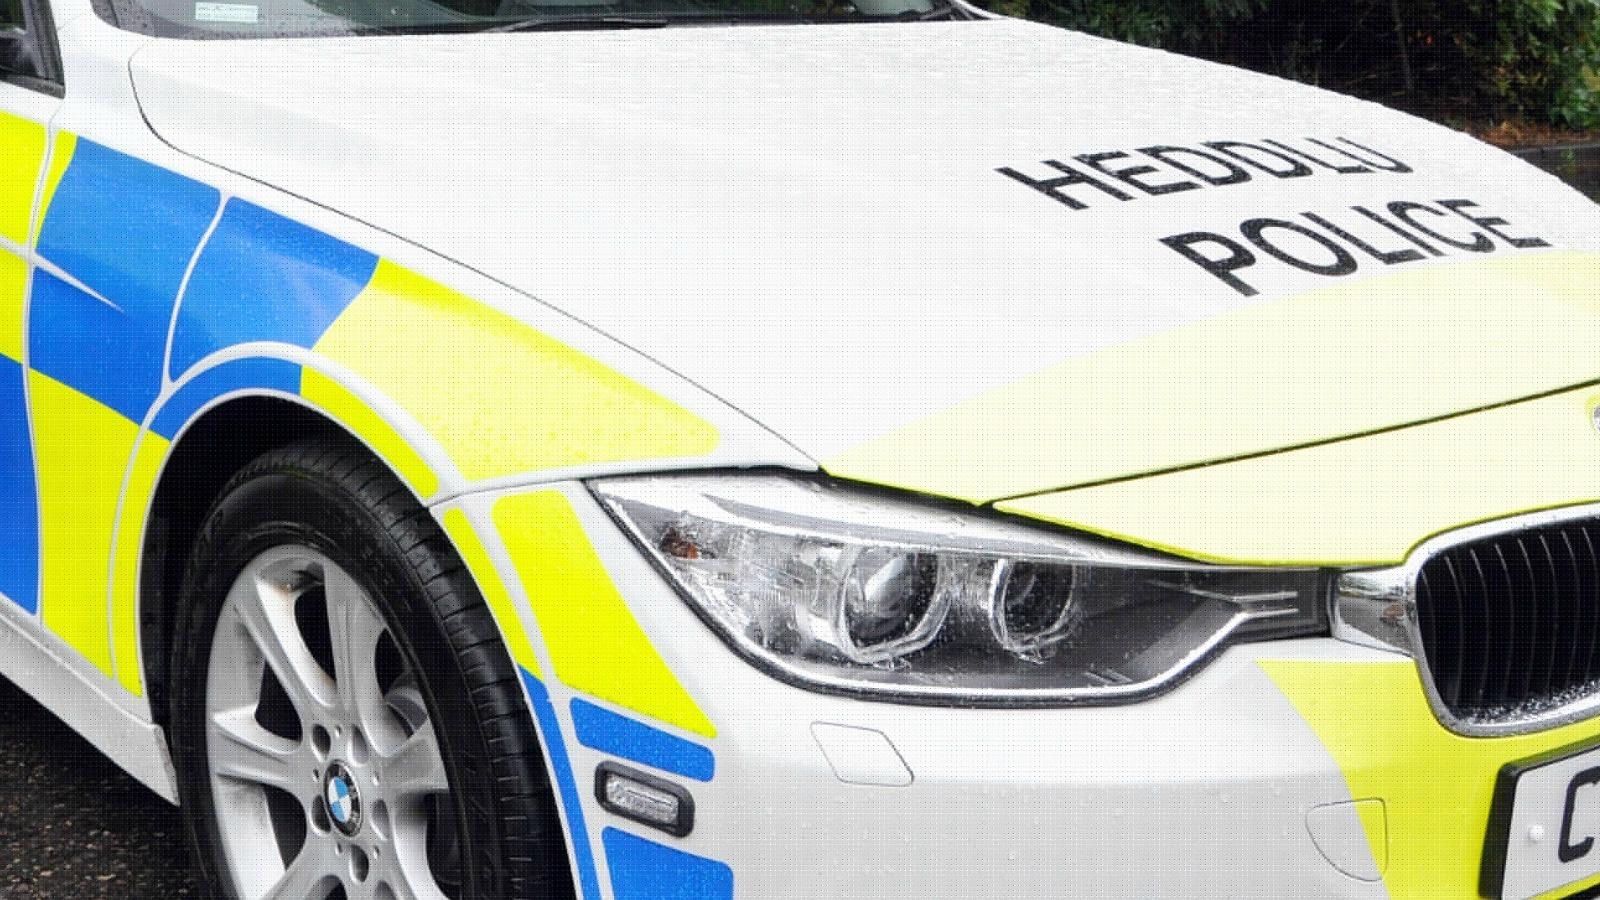 Residents to remain vigilant following suspicious behaviour in Dobshill